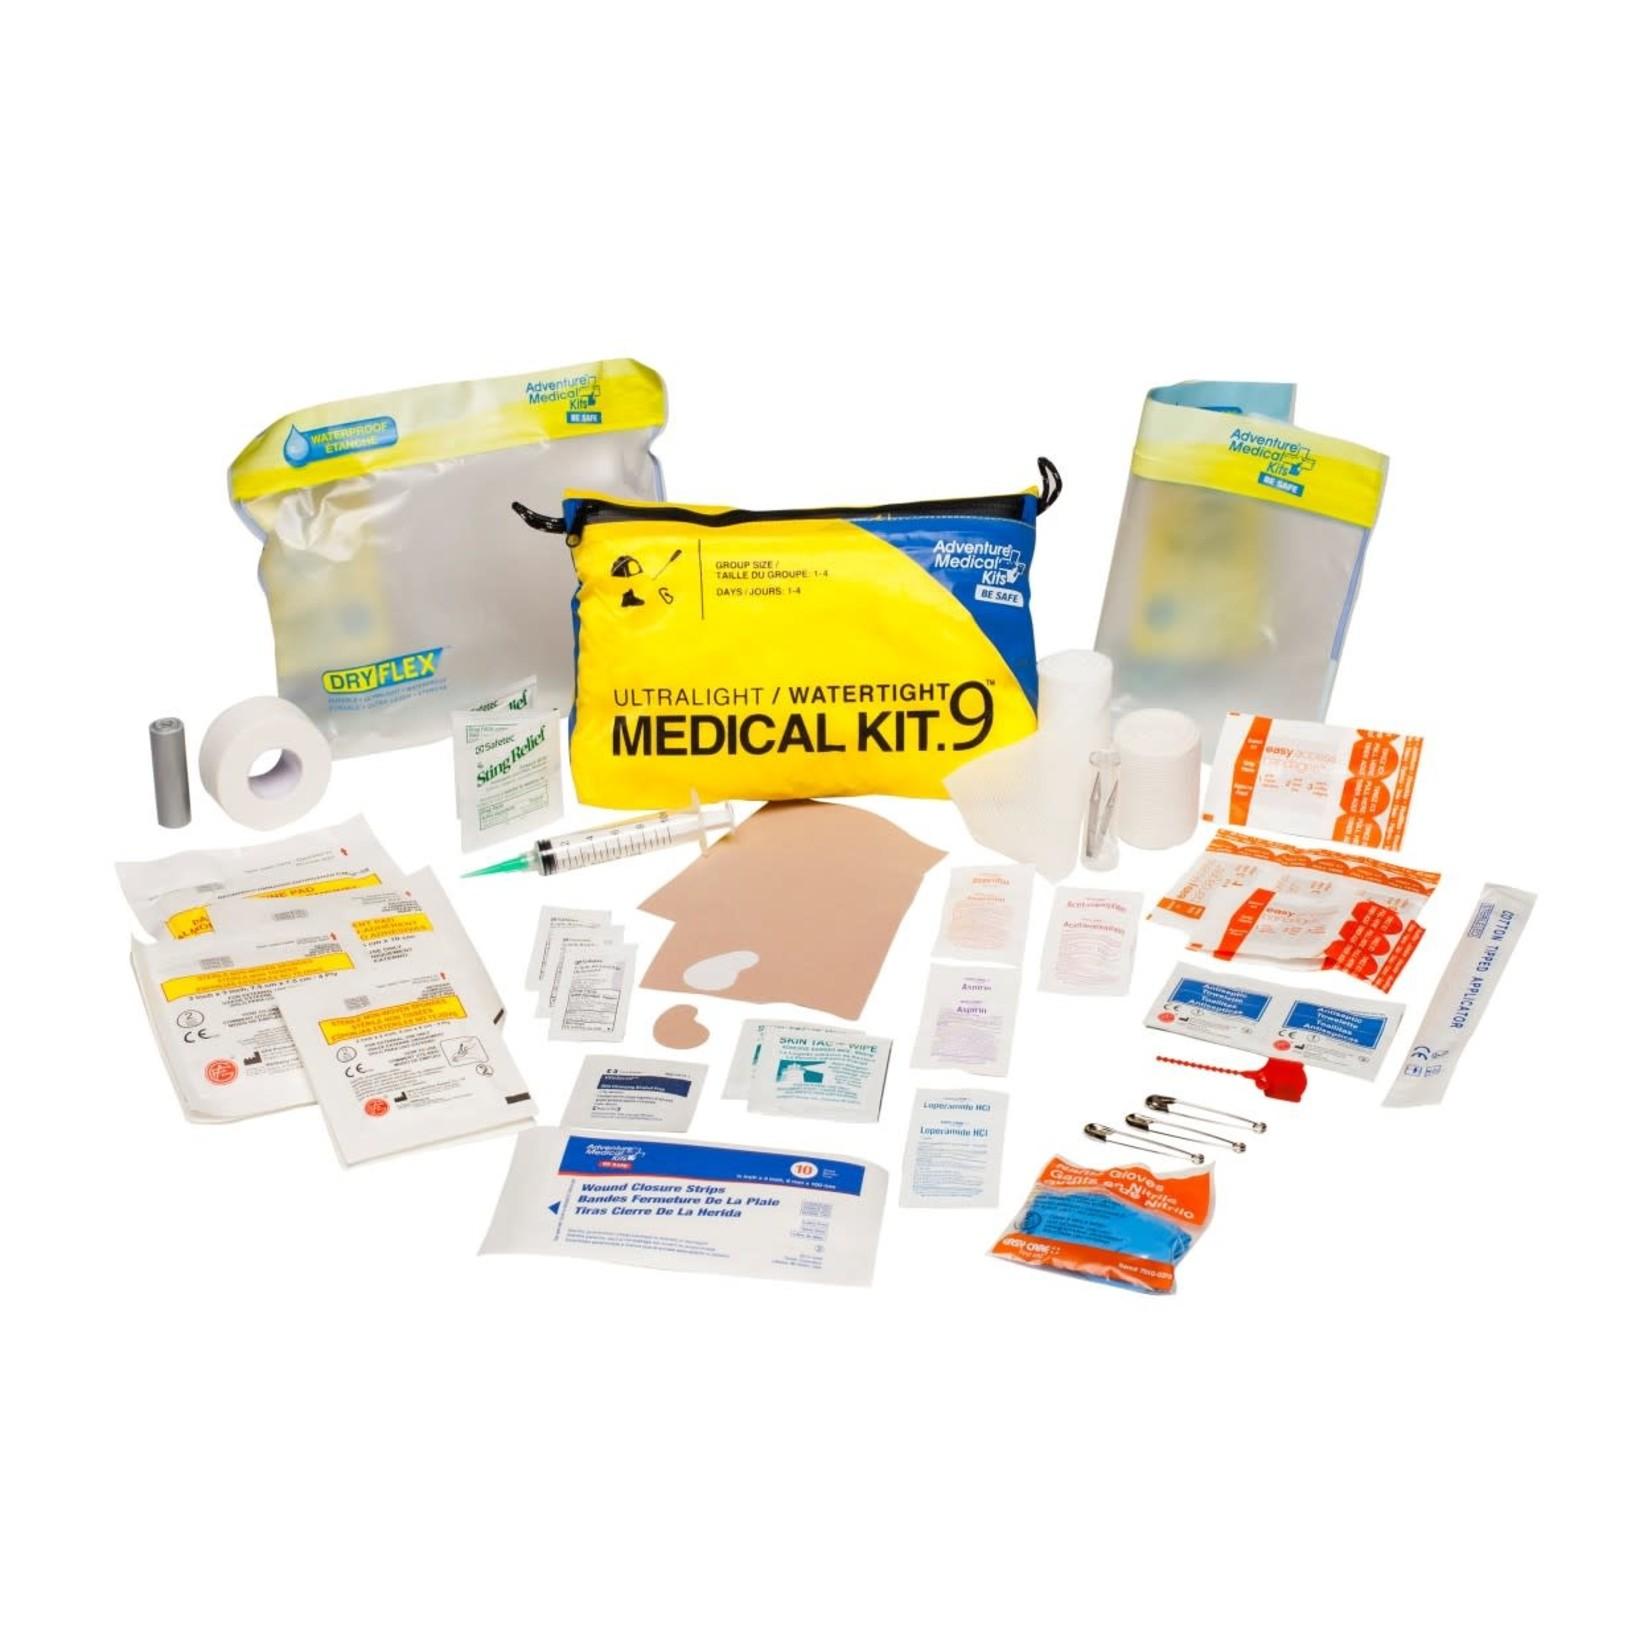 Adventure Medical Kit Trousse Adventure Medical Kit Ultralight 0.9